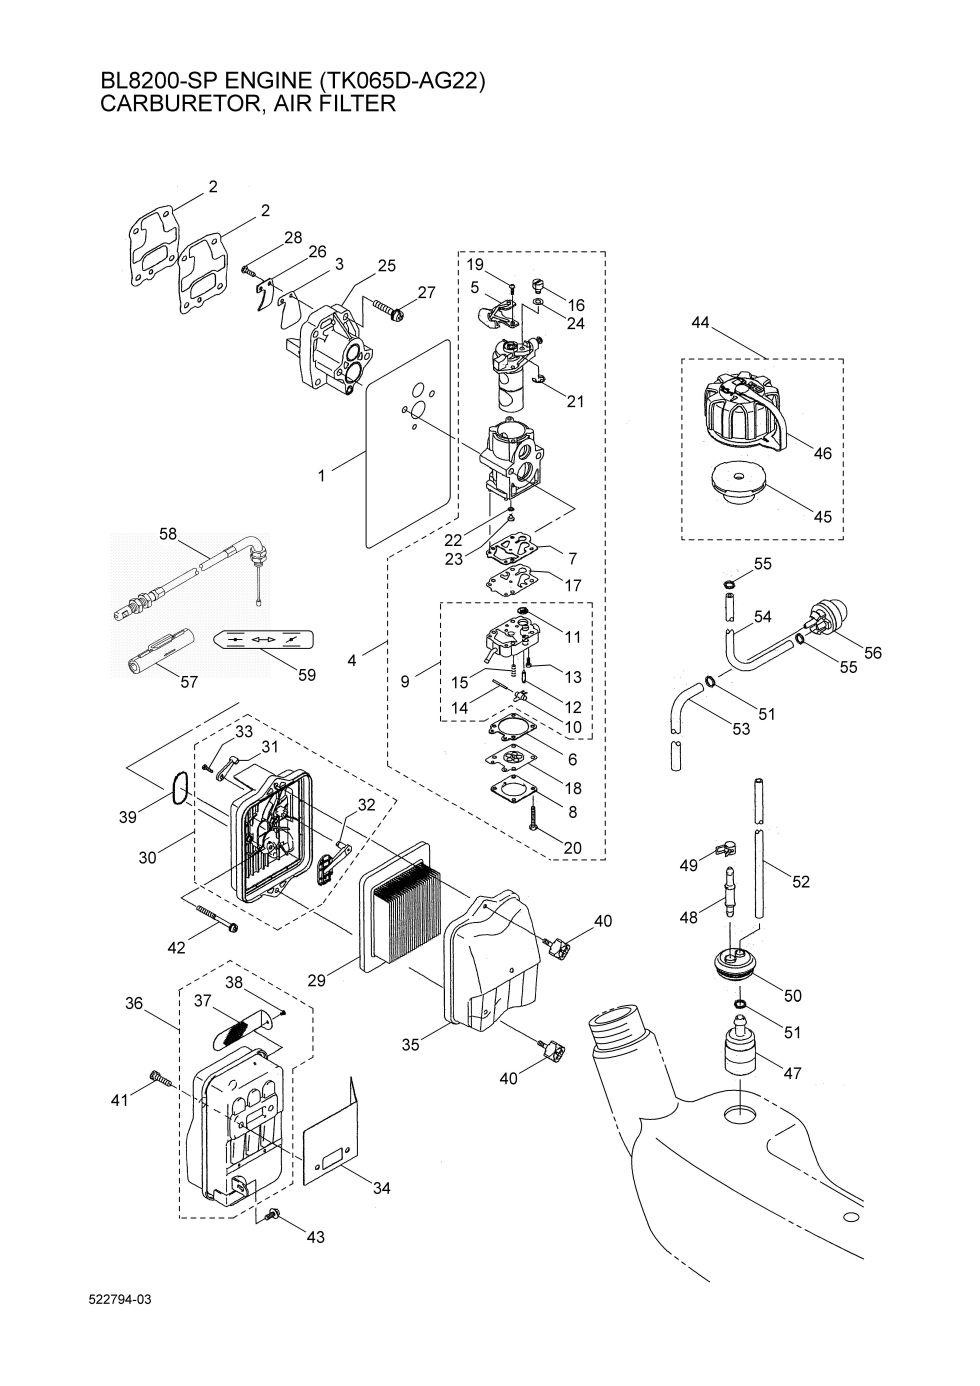 Bmw n55 wiring diagram bmw wiring diagram images